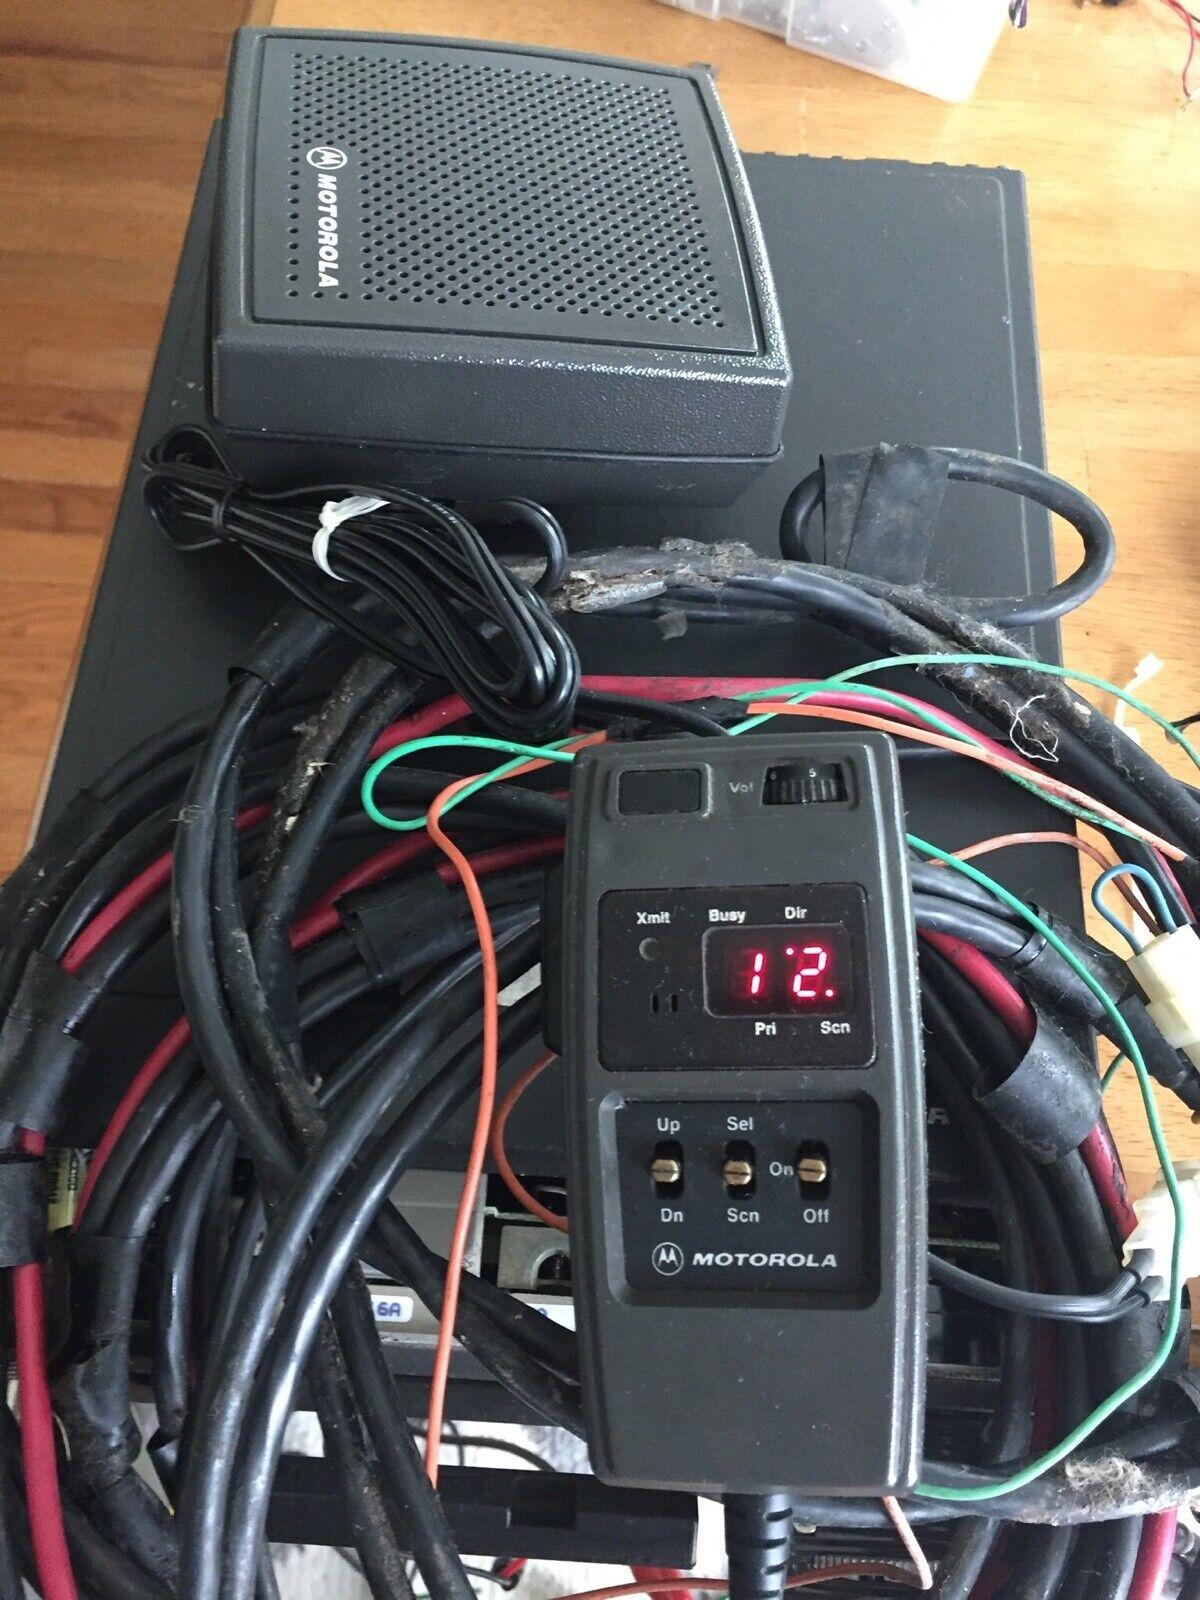 Motorola T81XTA7TA5BK Maratrac 110 Watt VHF Low Band 99 Channel Radio /HCN1051A. Buy it now for 99.99